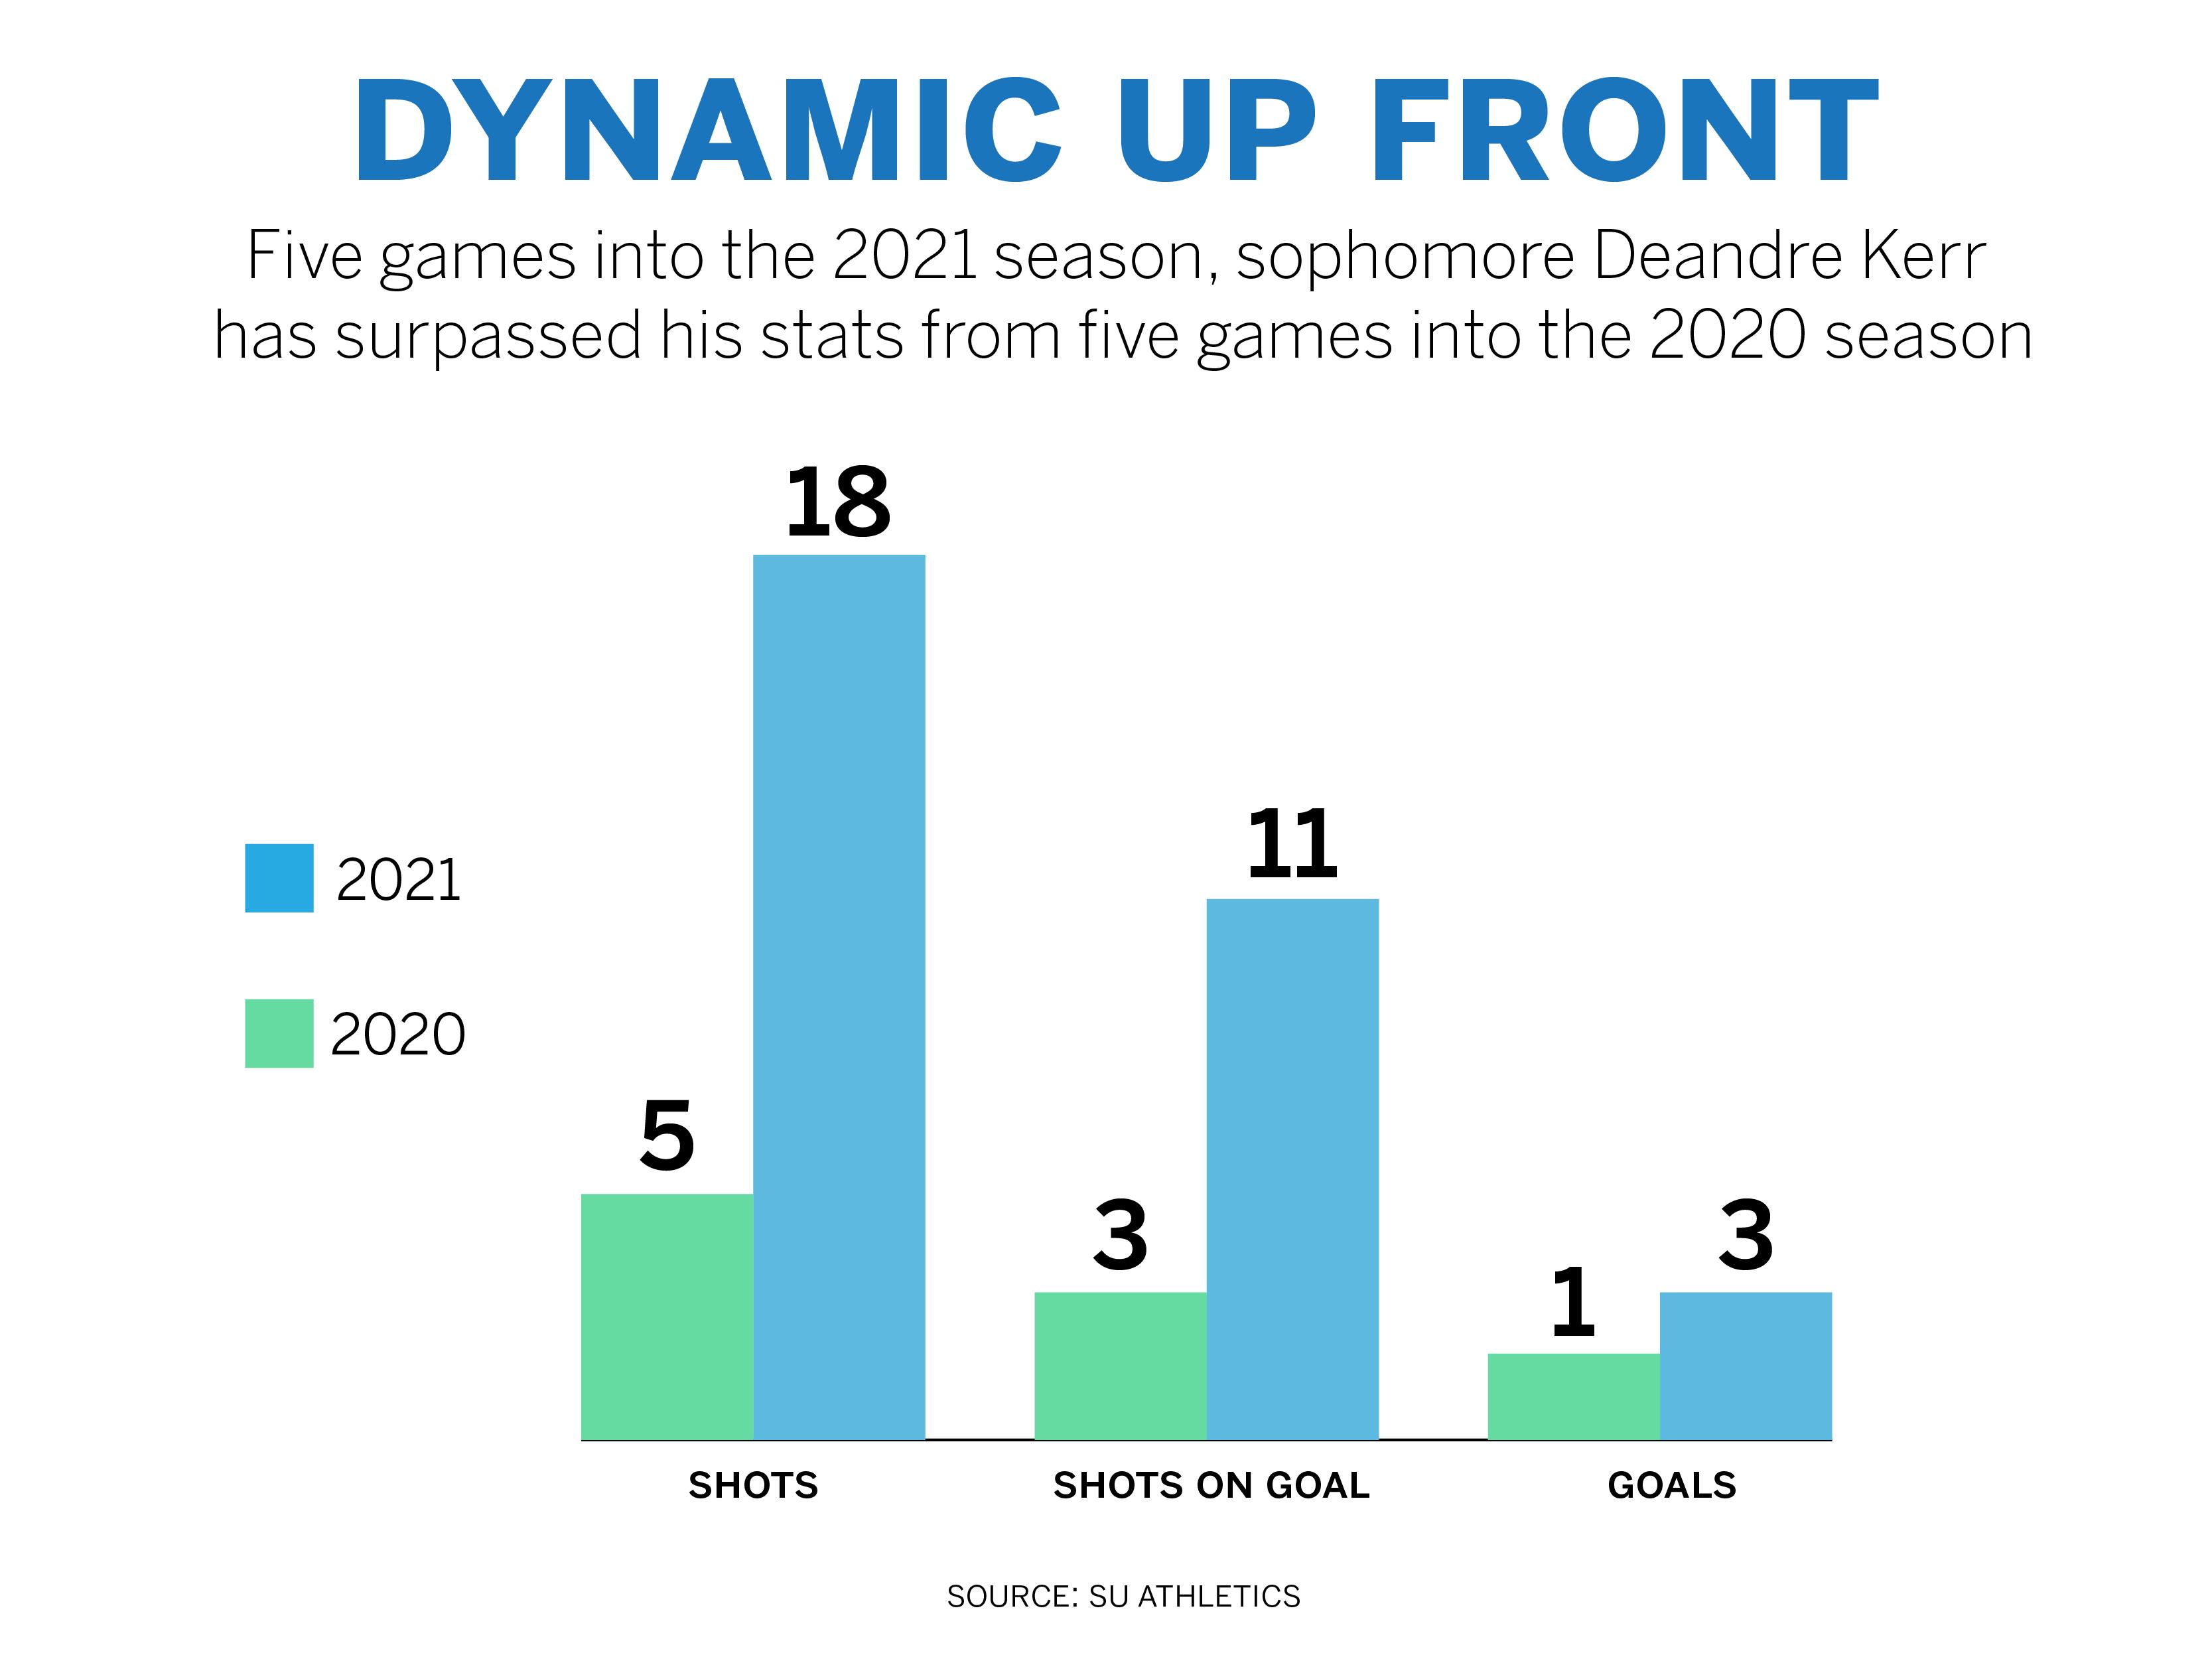 Deandre Kerr showed improvement from the 2020 season.